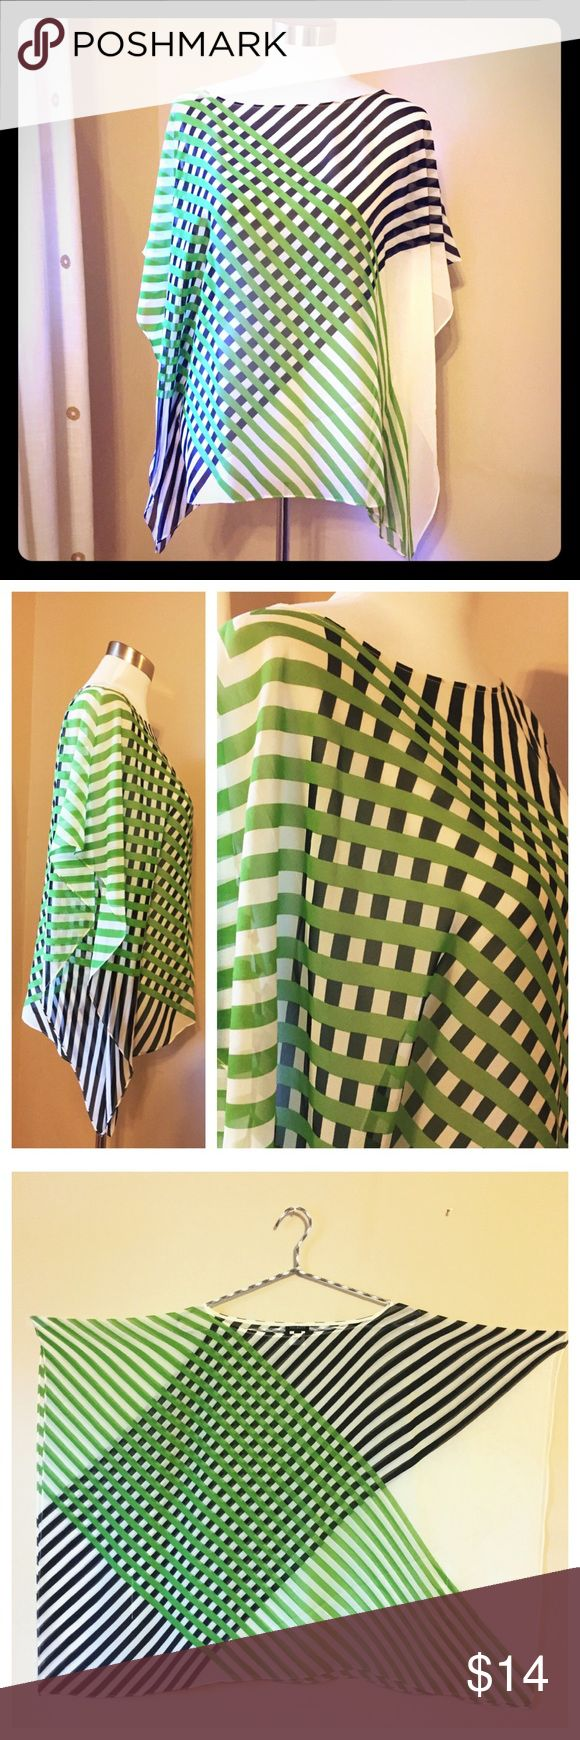 "Talbots Silk Sheer Striped Dolman Batwing Top XS/S Talbots Silk Sheer Striped Blue Green Coverup Dolman Batwing Top XS / S NWOT   Total size • 36"" width  • 25"" length  Bust 22"" 100% silk Talbots Tops"